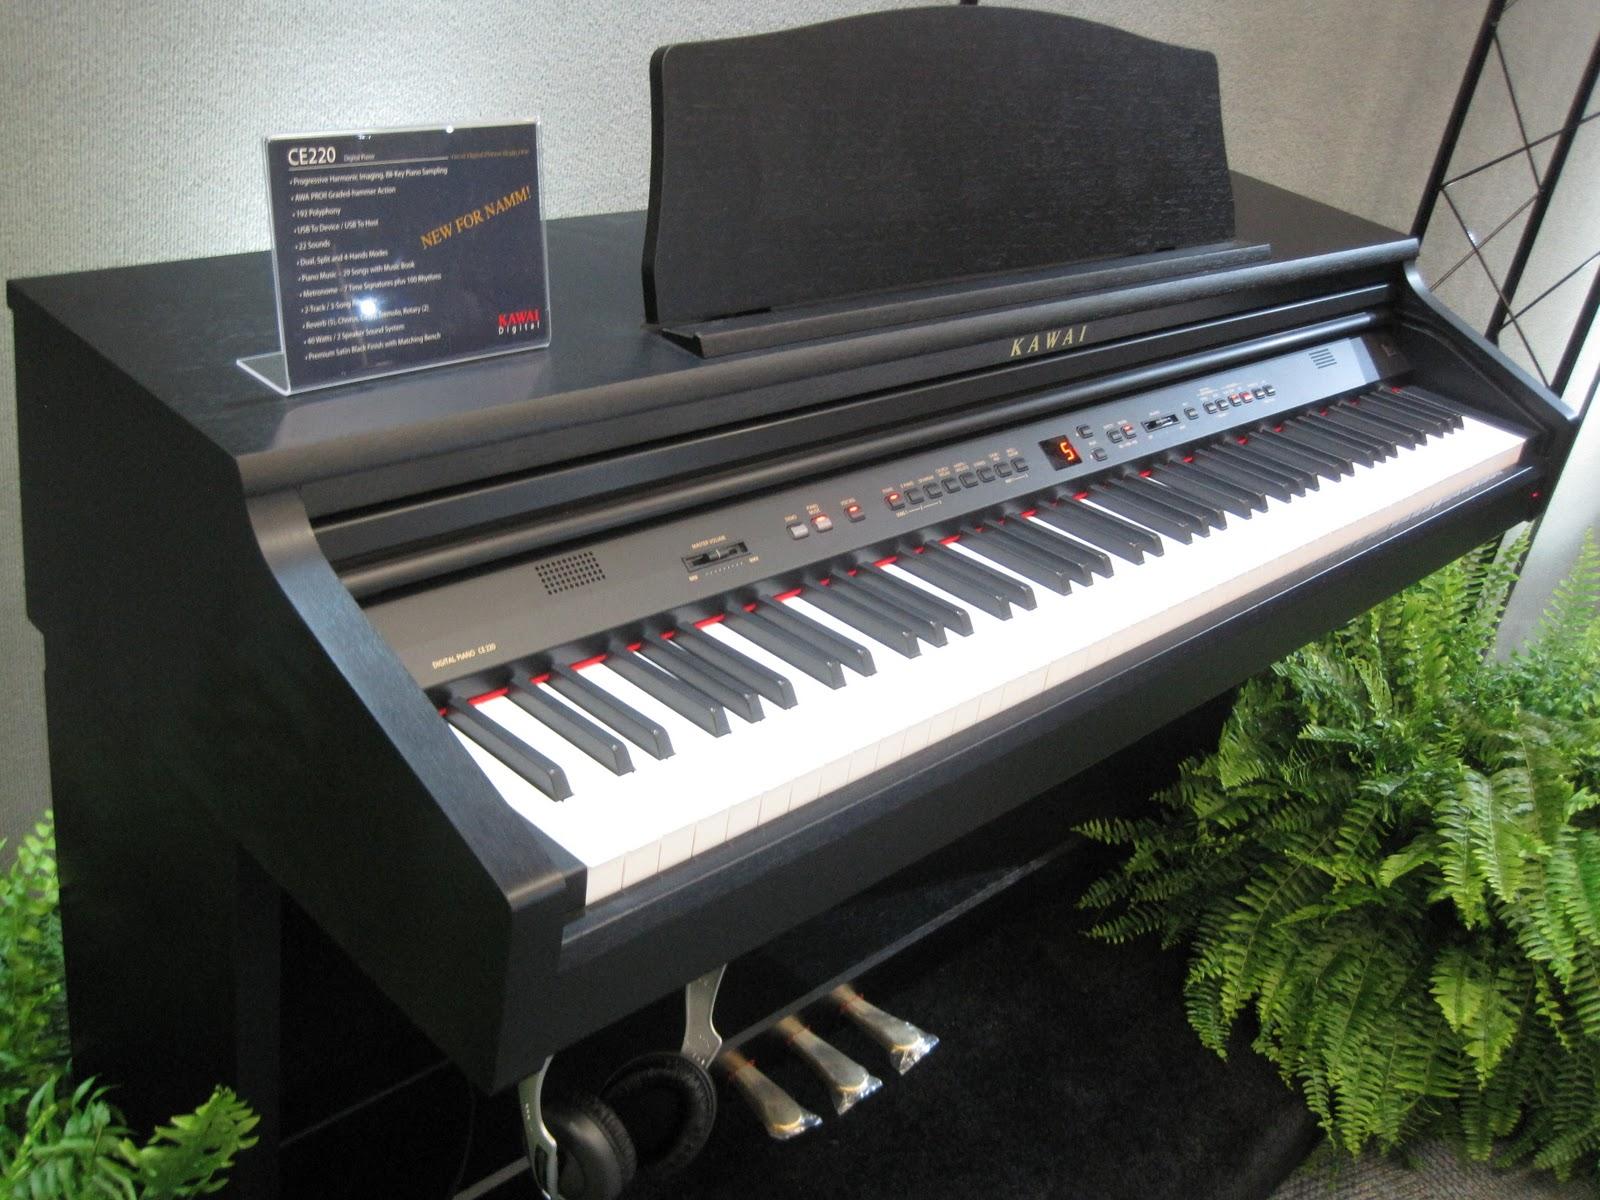 az piano reviews review yamaha clp430 clp440 clp470 clp480 clavinova digital pianos. Black Bedroom Furniture Sets. Home Design Ideas